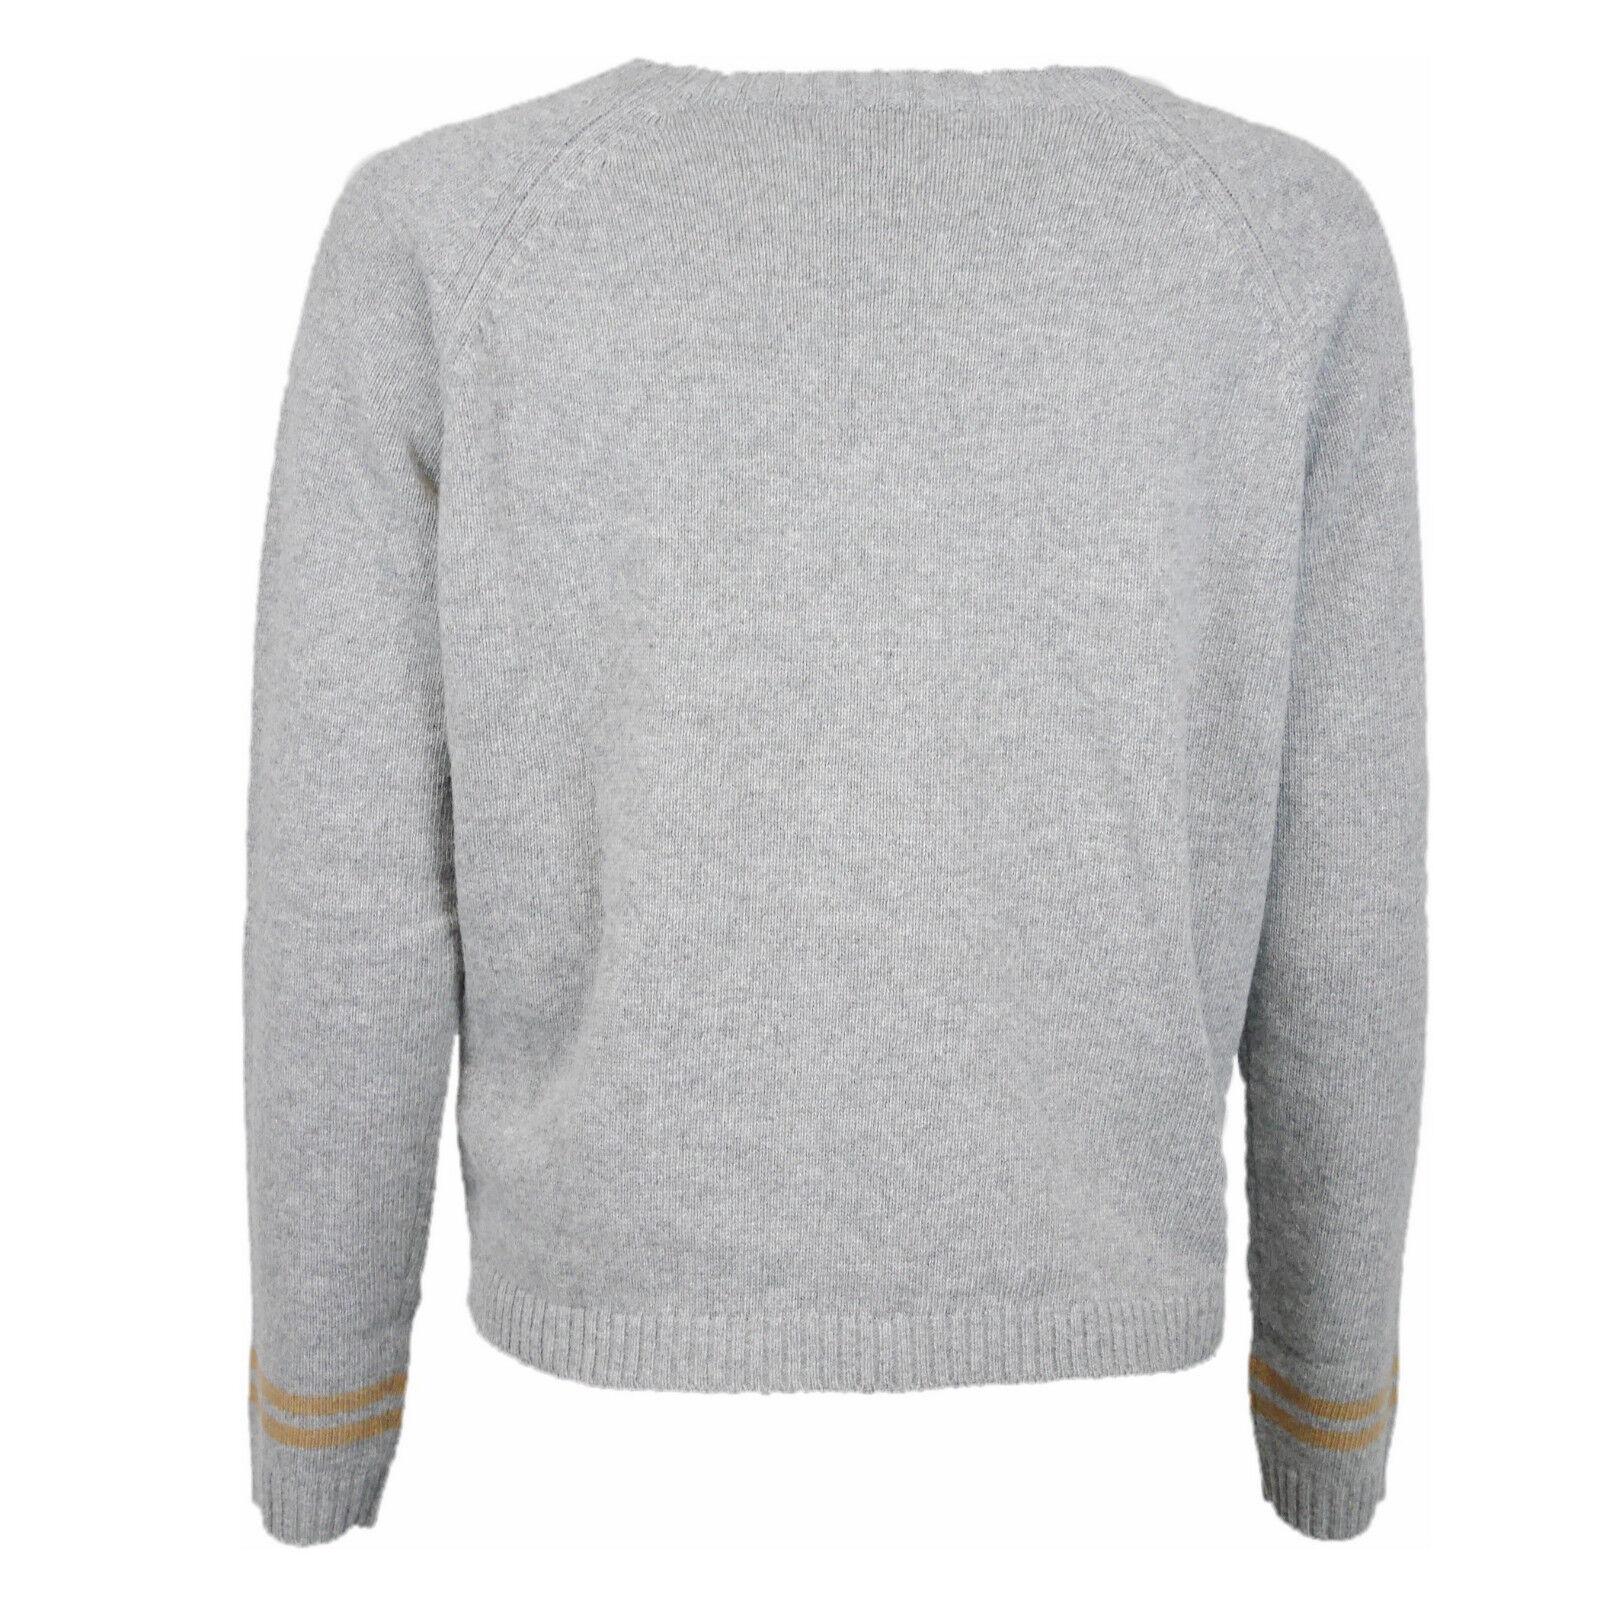 KANGRA MAGLIONE UOMO grigio 56 grigio UOMO chiaro lana twill 096b0e